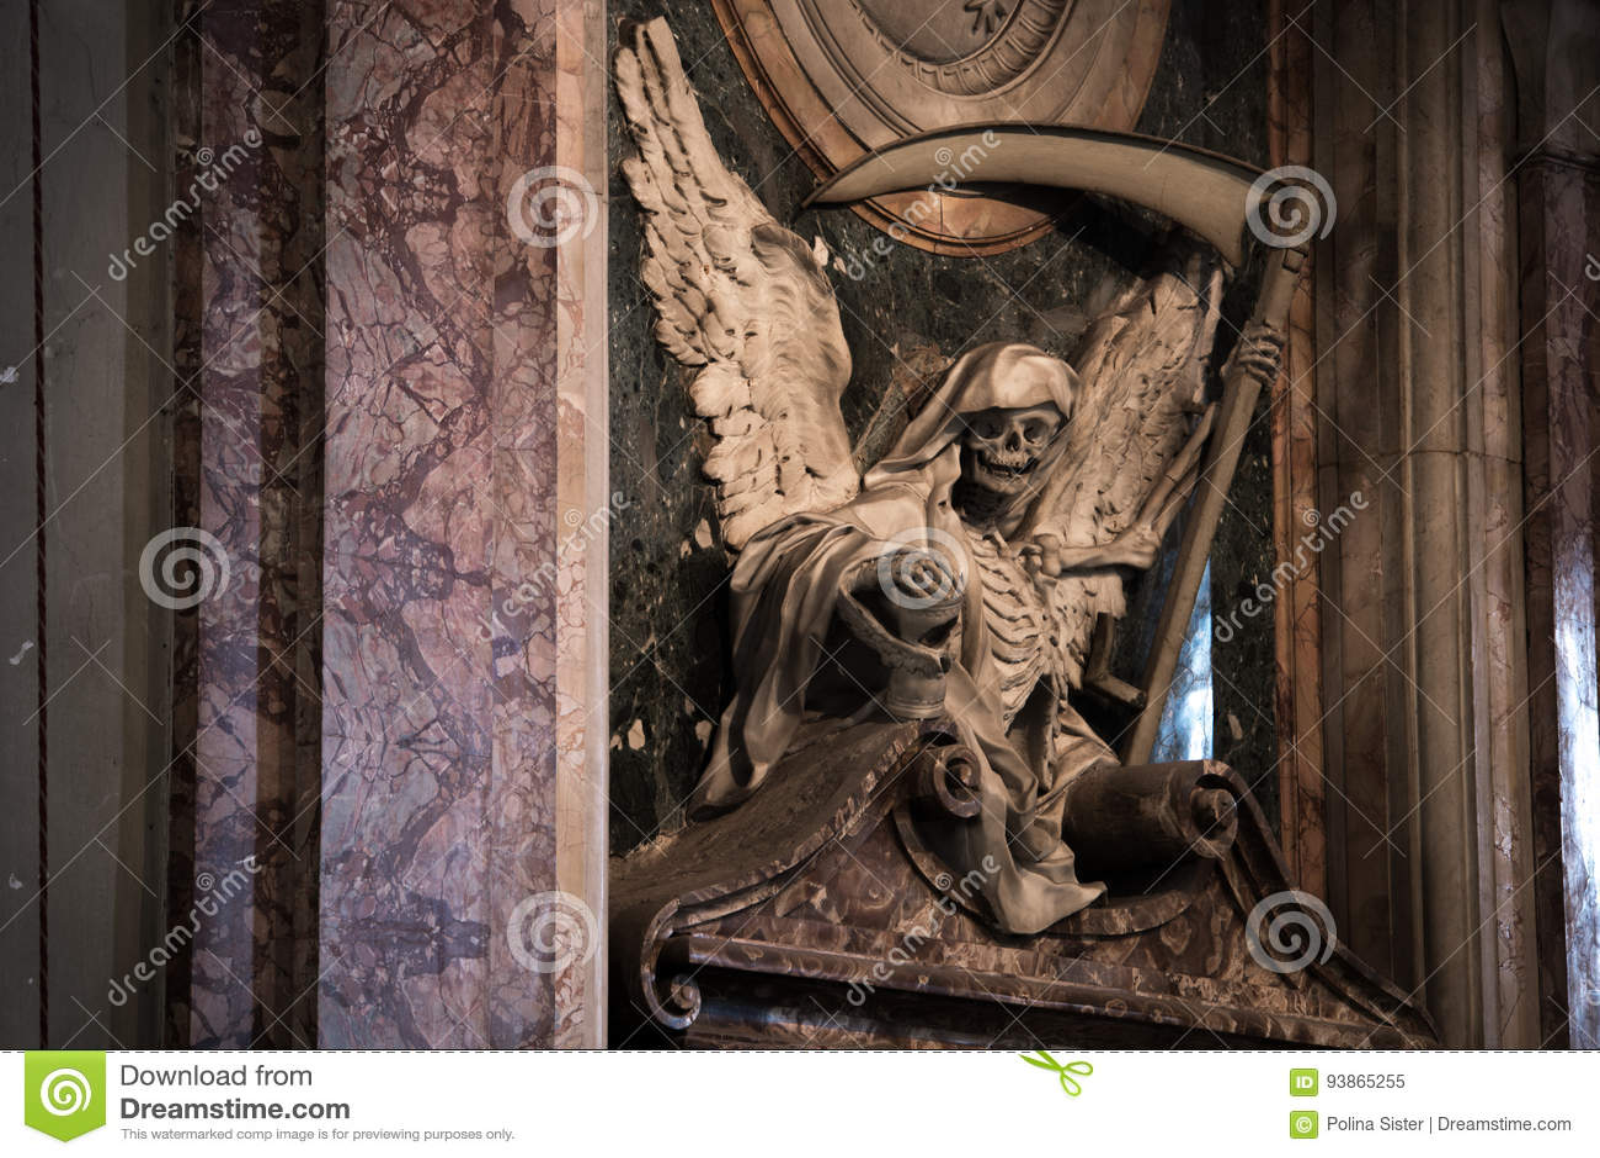 Angel of death stock image image of architecture cardinal royalty free stock photo buycottarizona Images